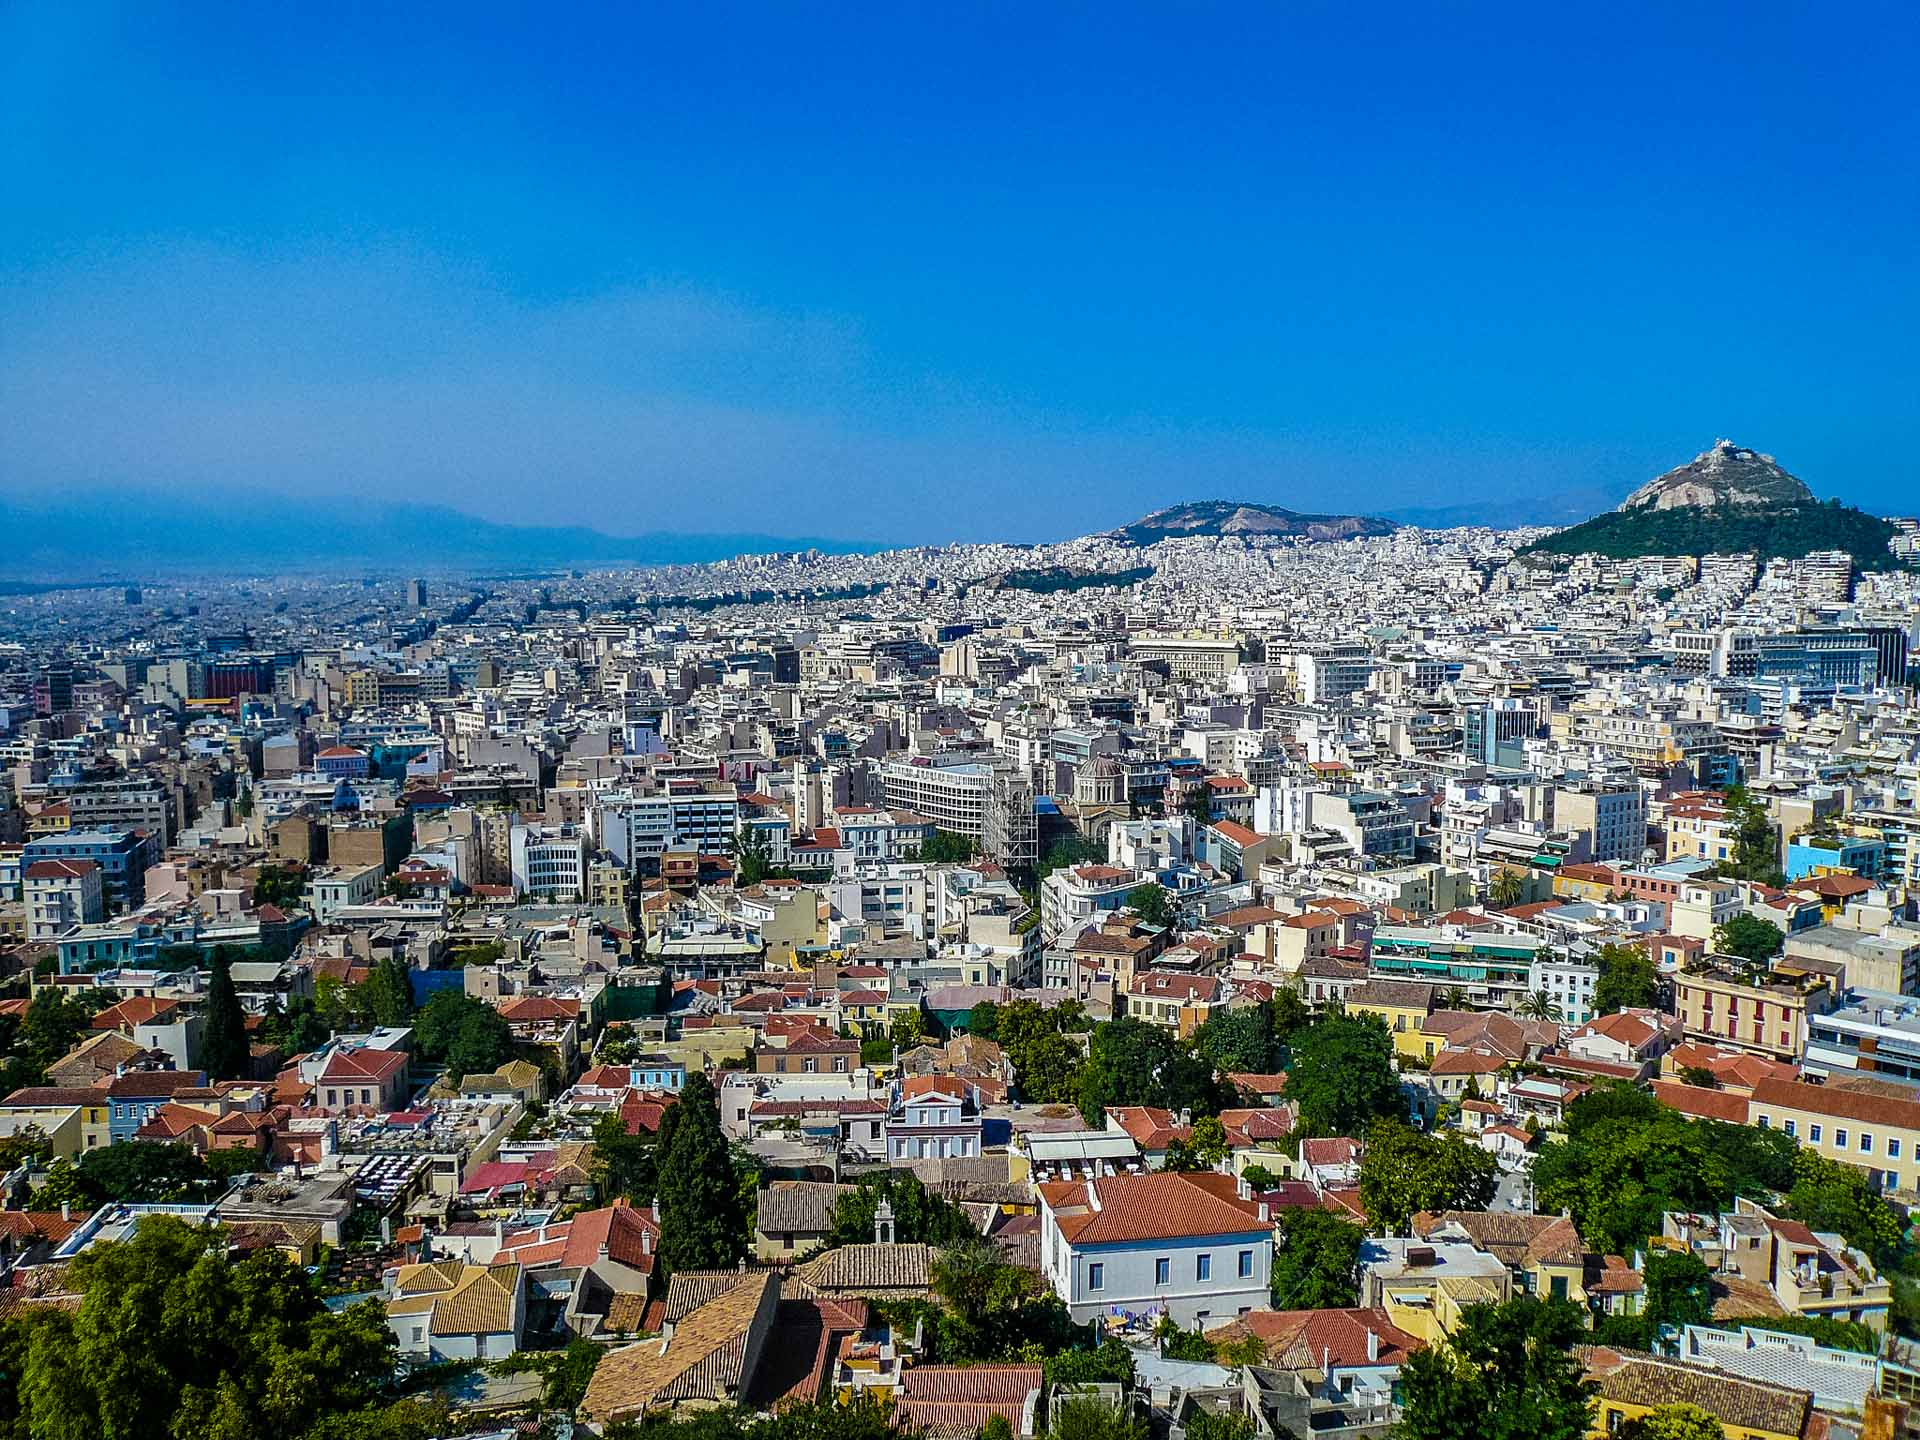 Atene - front